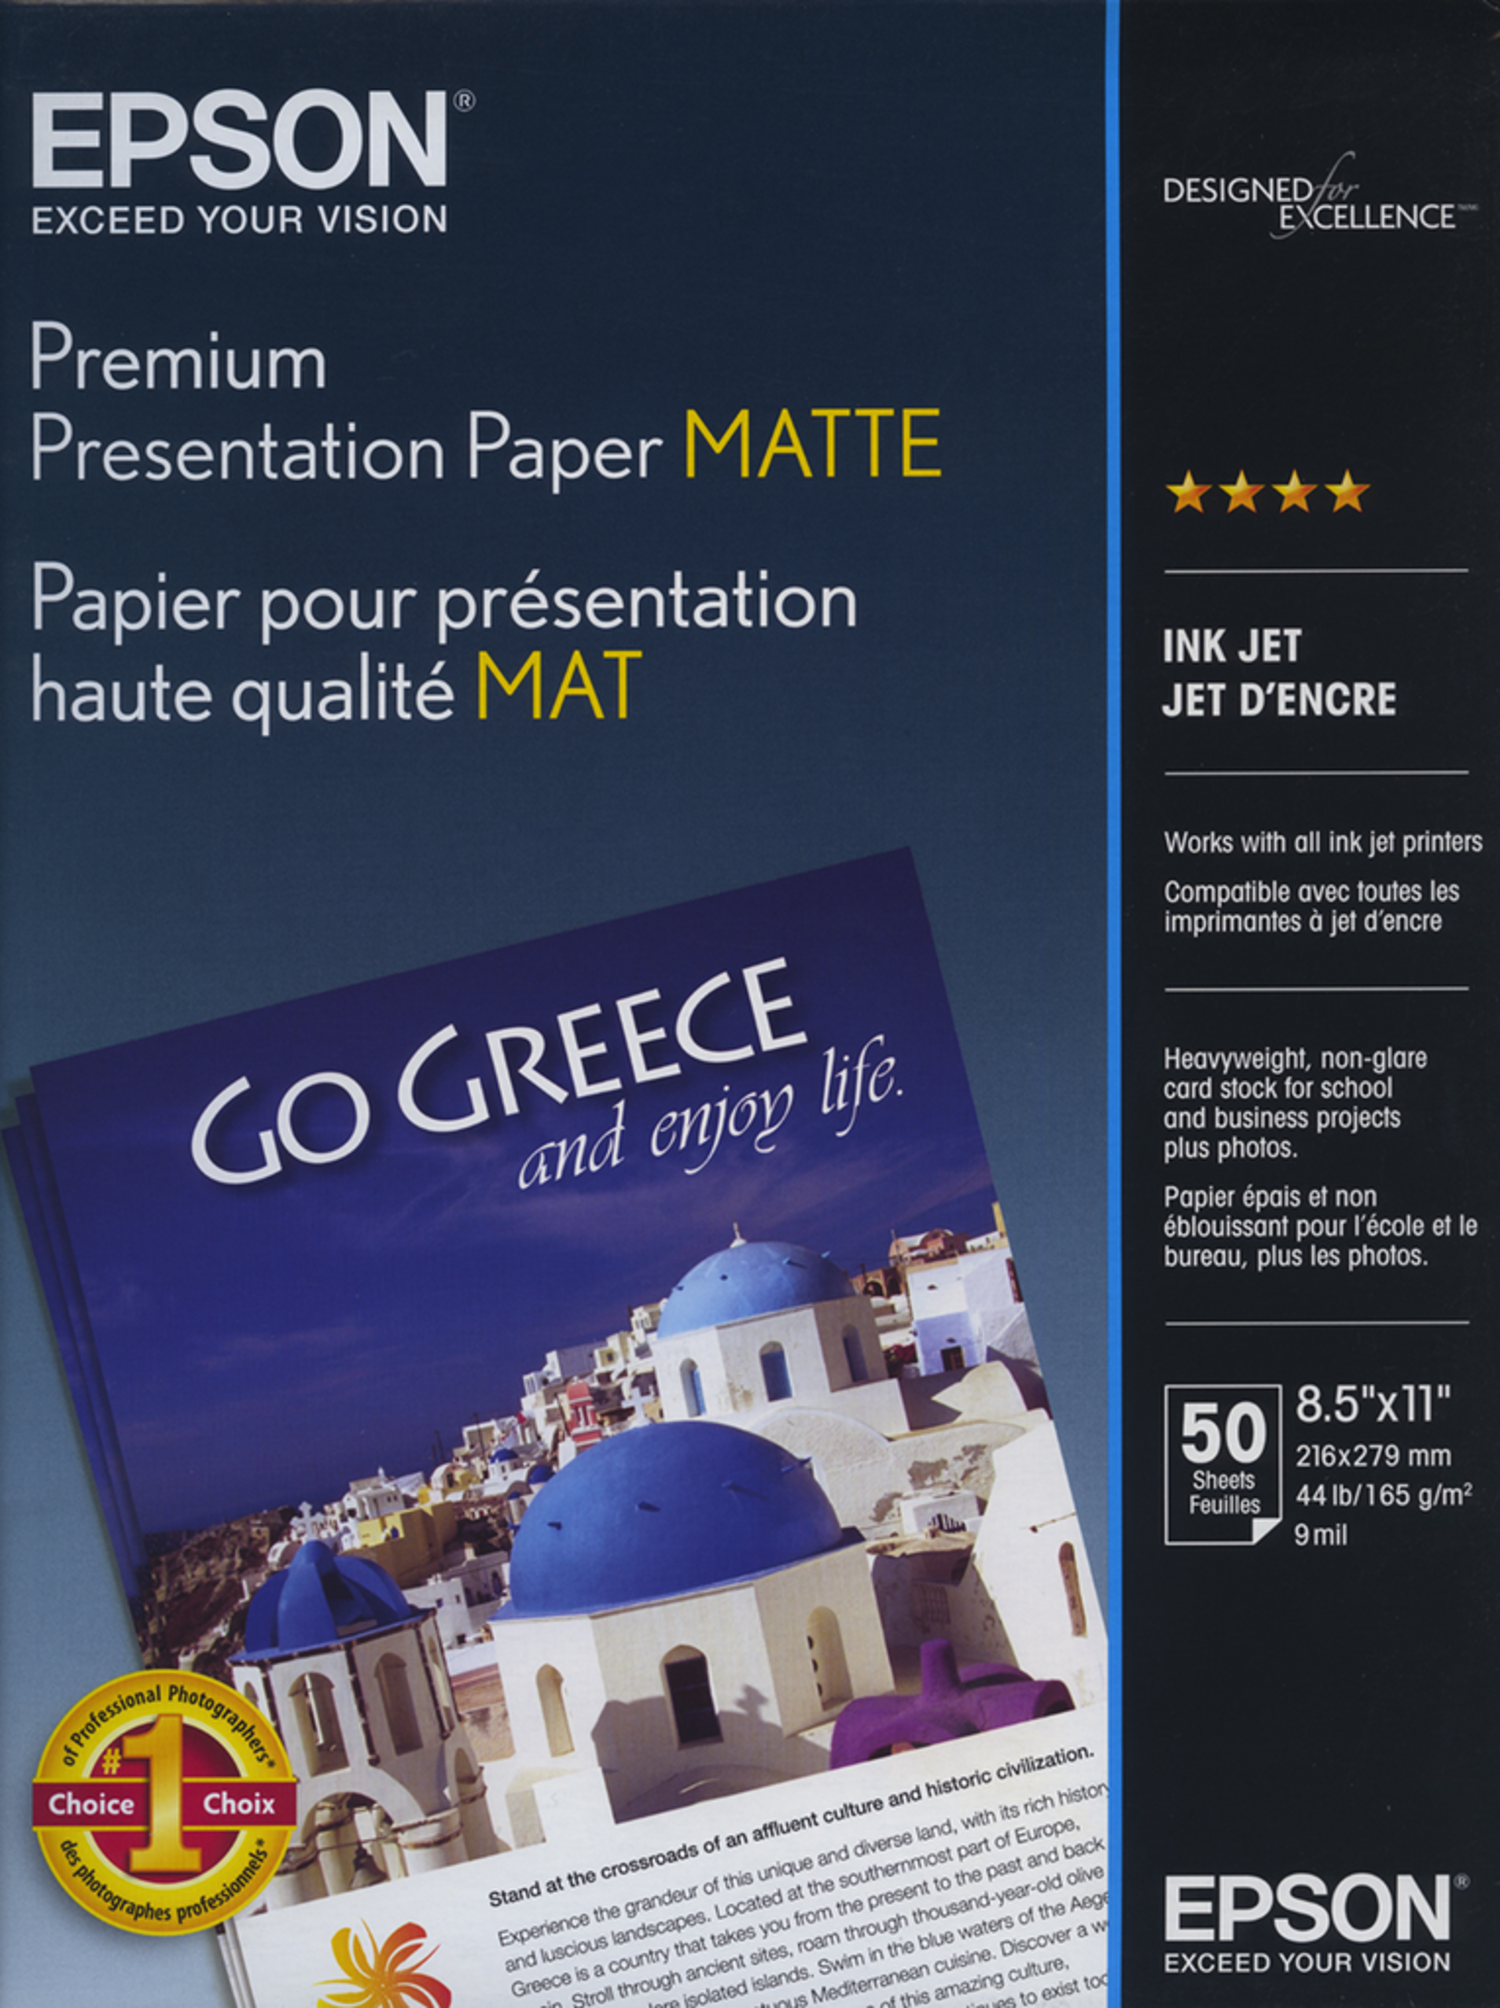 Epson Premium Presentation Paper Matte - 8 5x11 - 50 Sheets